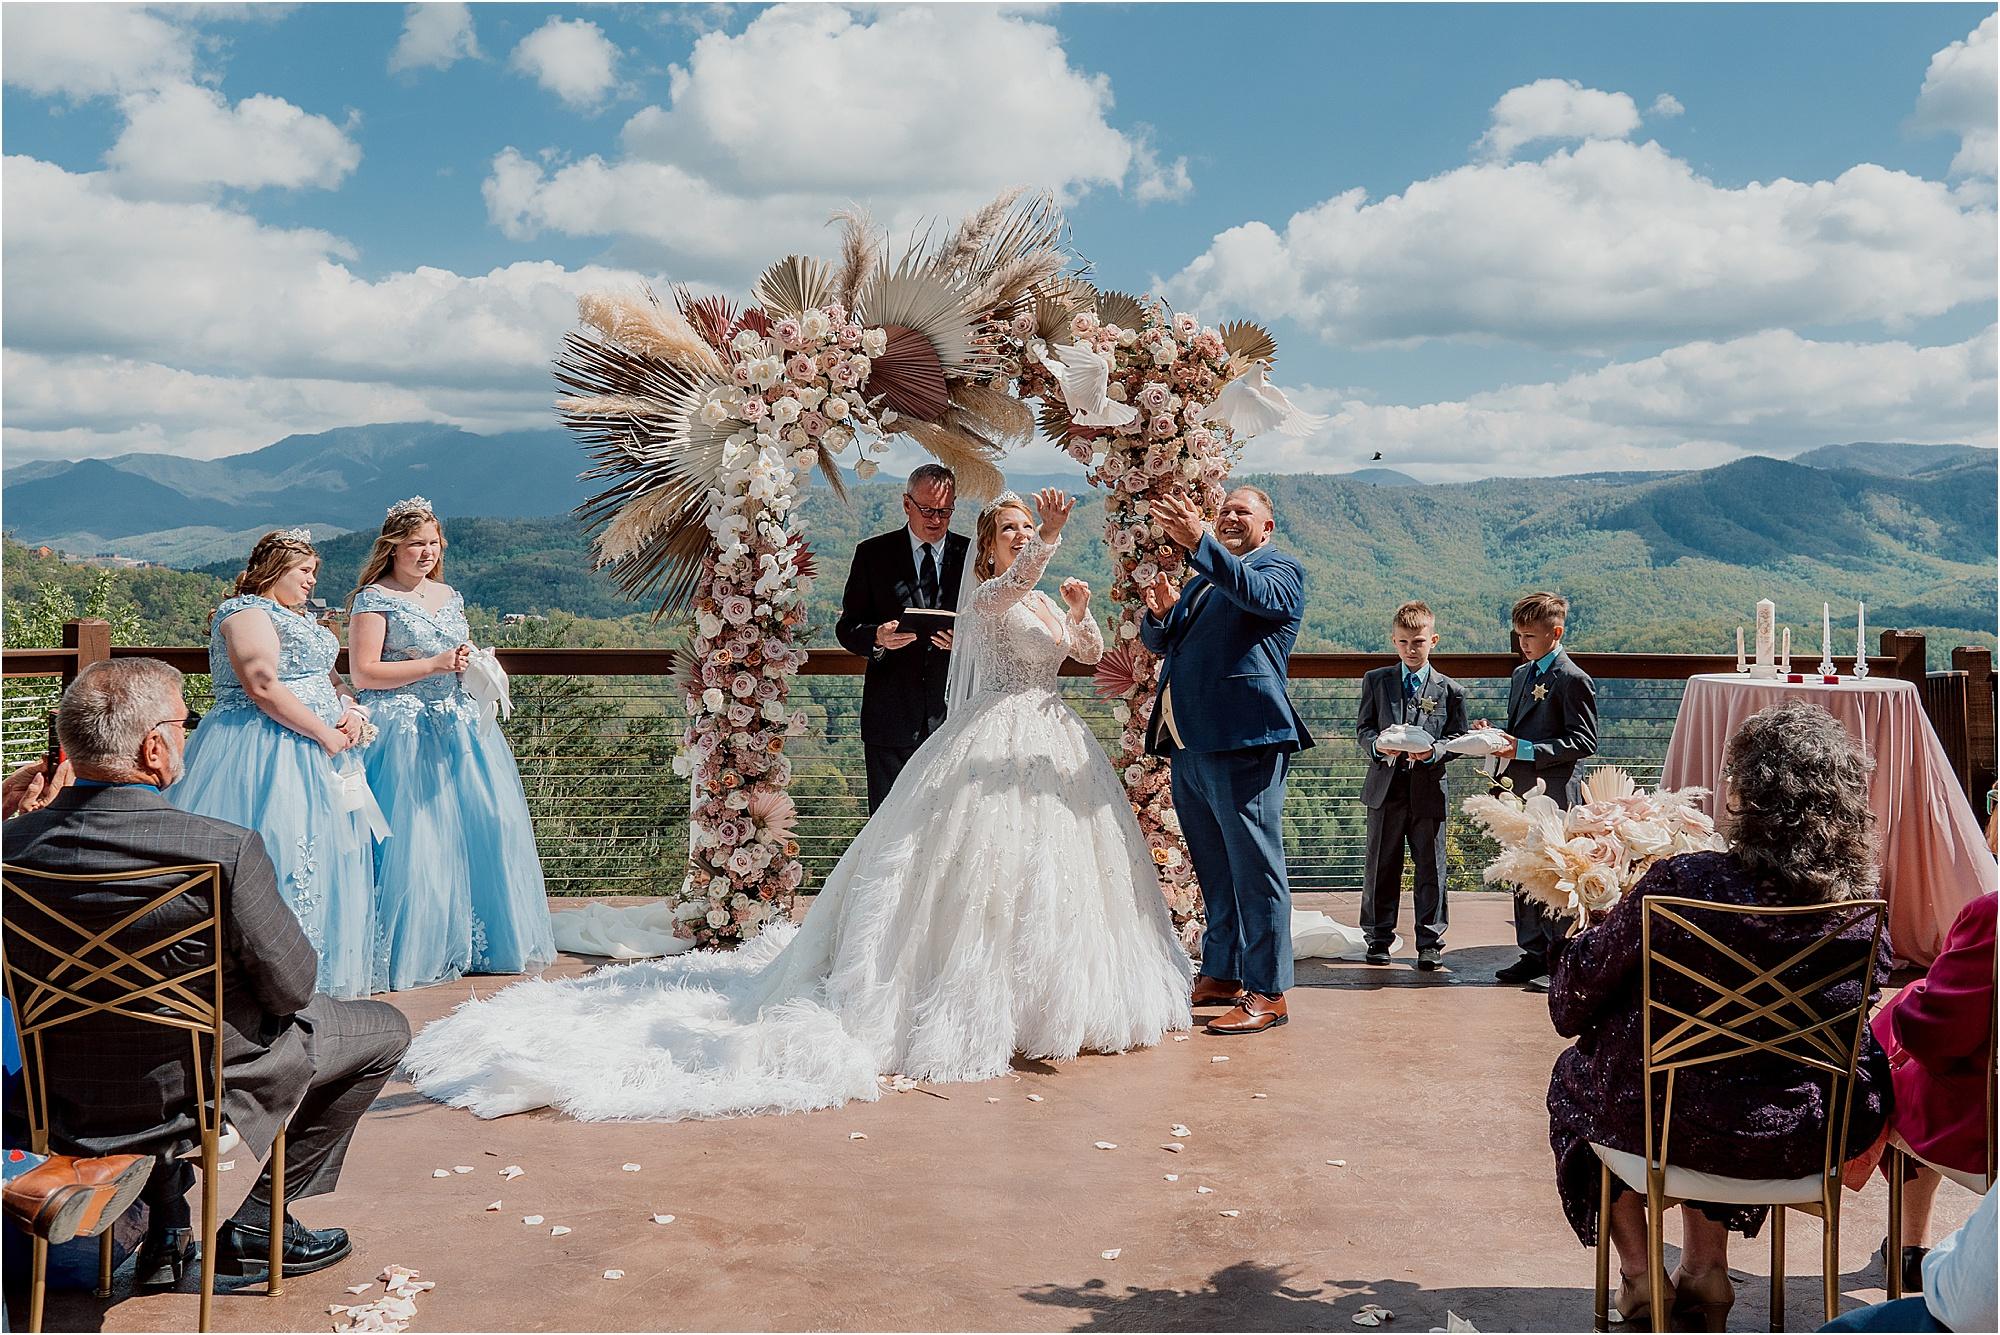 bride and groom wedding under dried floral wedding arch